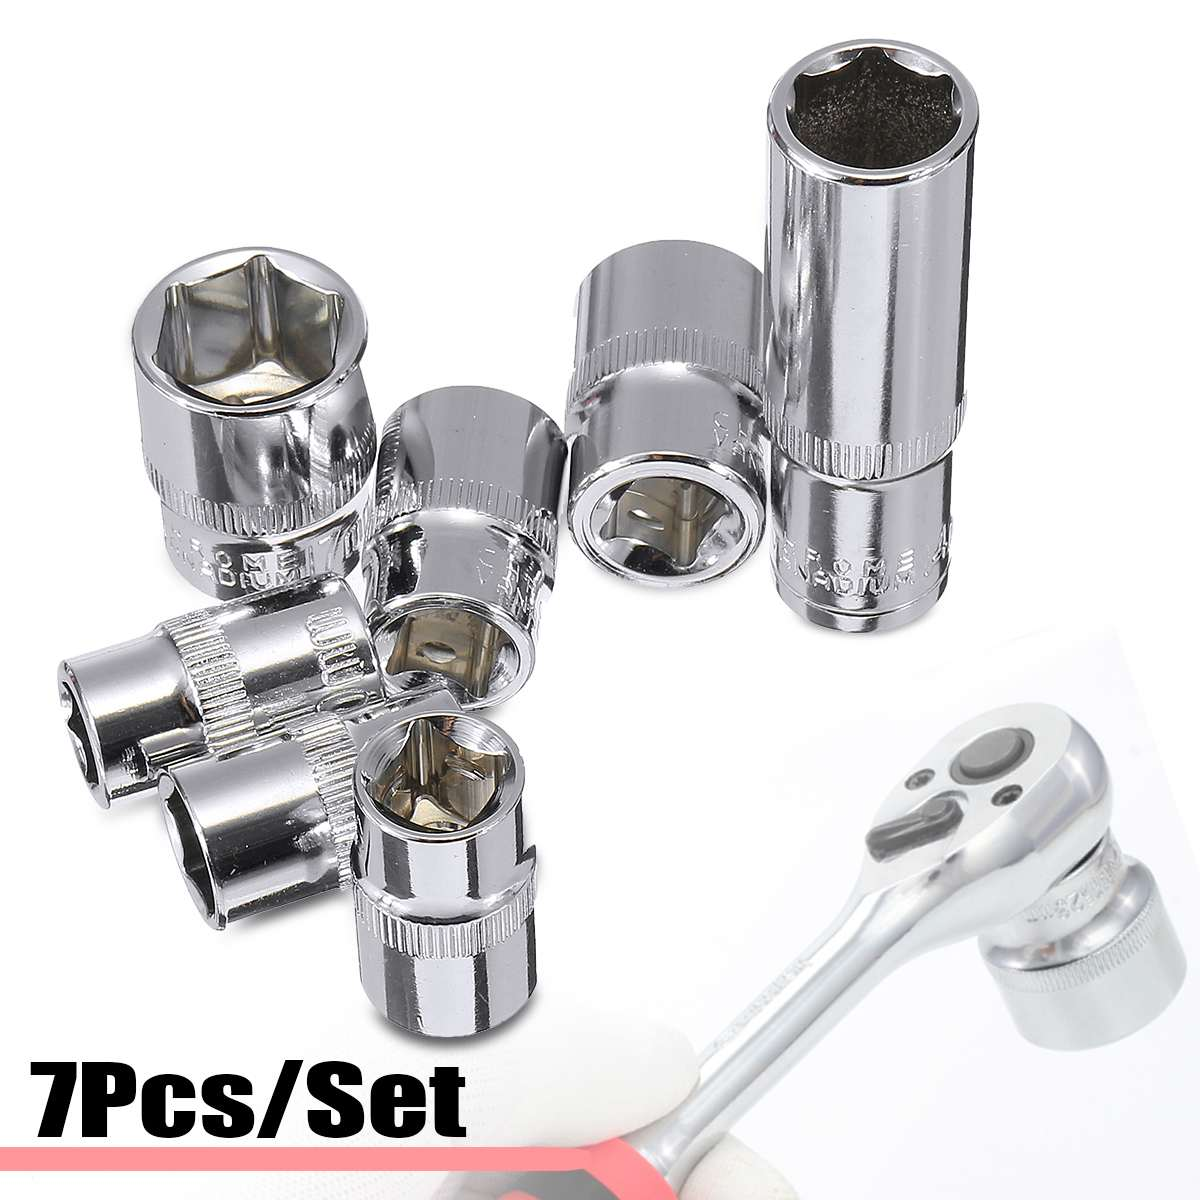 Doersupp 7Pcs Ratchet Wrench Socket Adapter Drill Bit Head Torque Spanner Socket 10/ 12/ 13/ 14/ 15/ 17mm Chrome Vanadium Steel